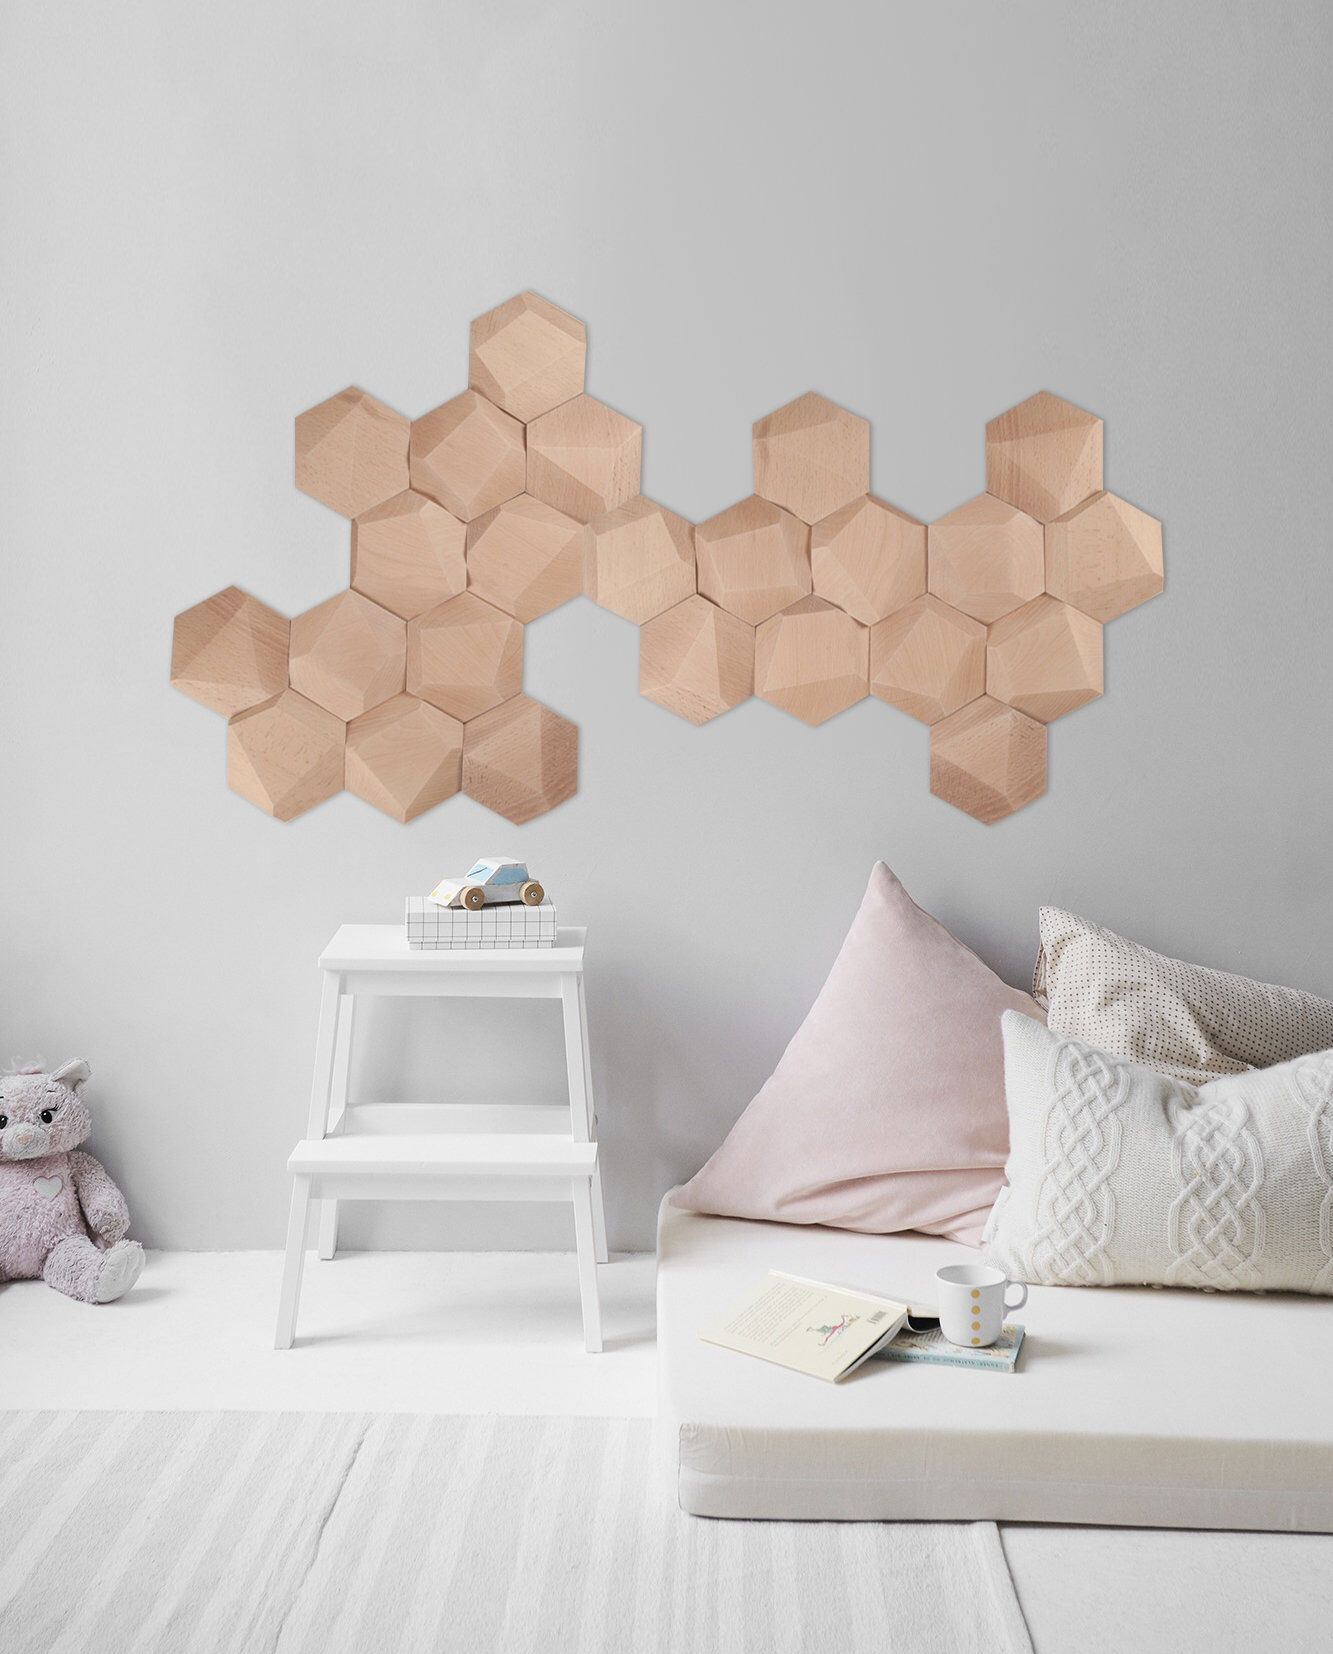 Baby room wall decor nursery decor geometric wall art nursery